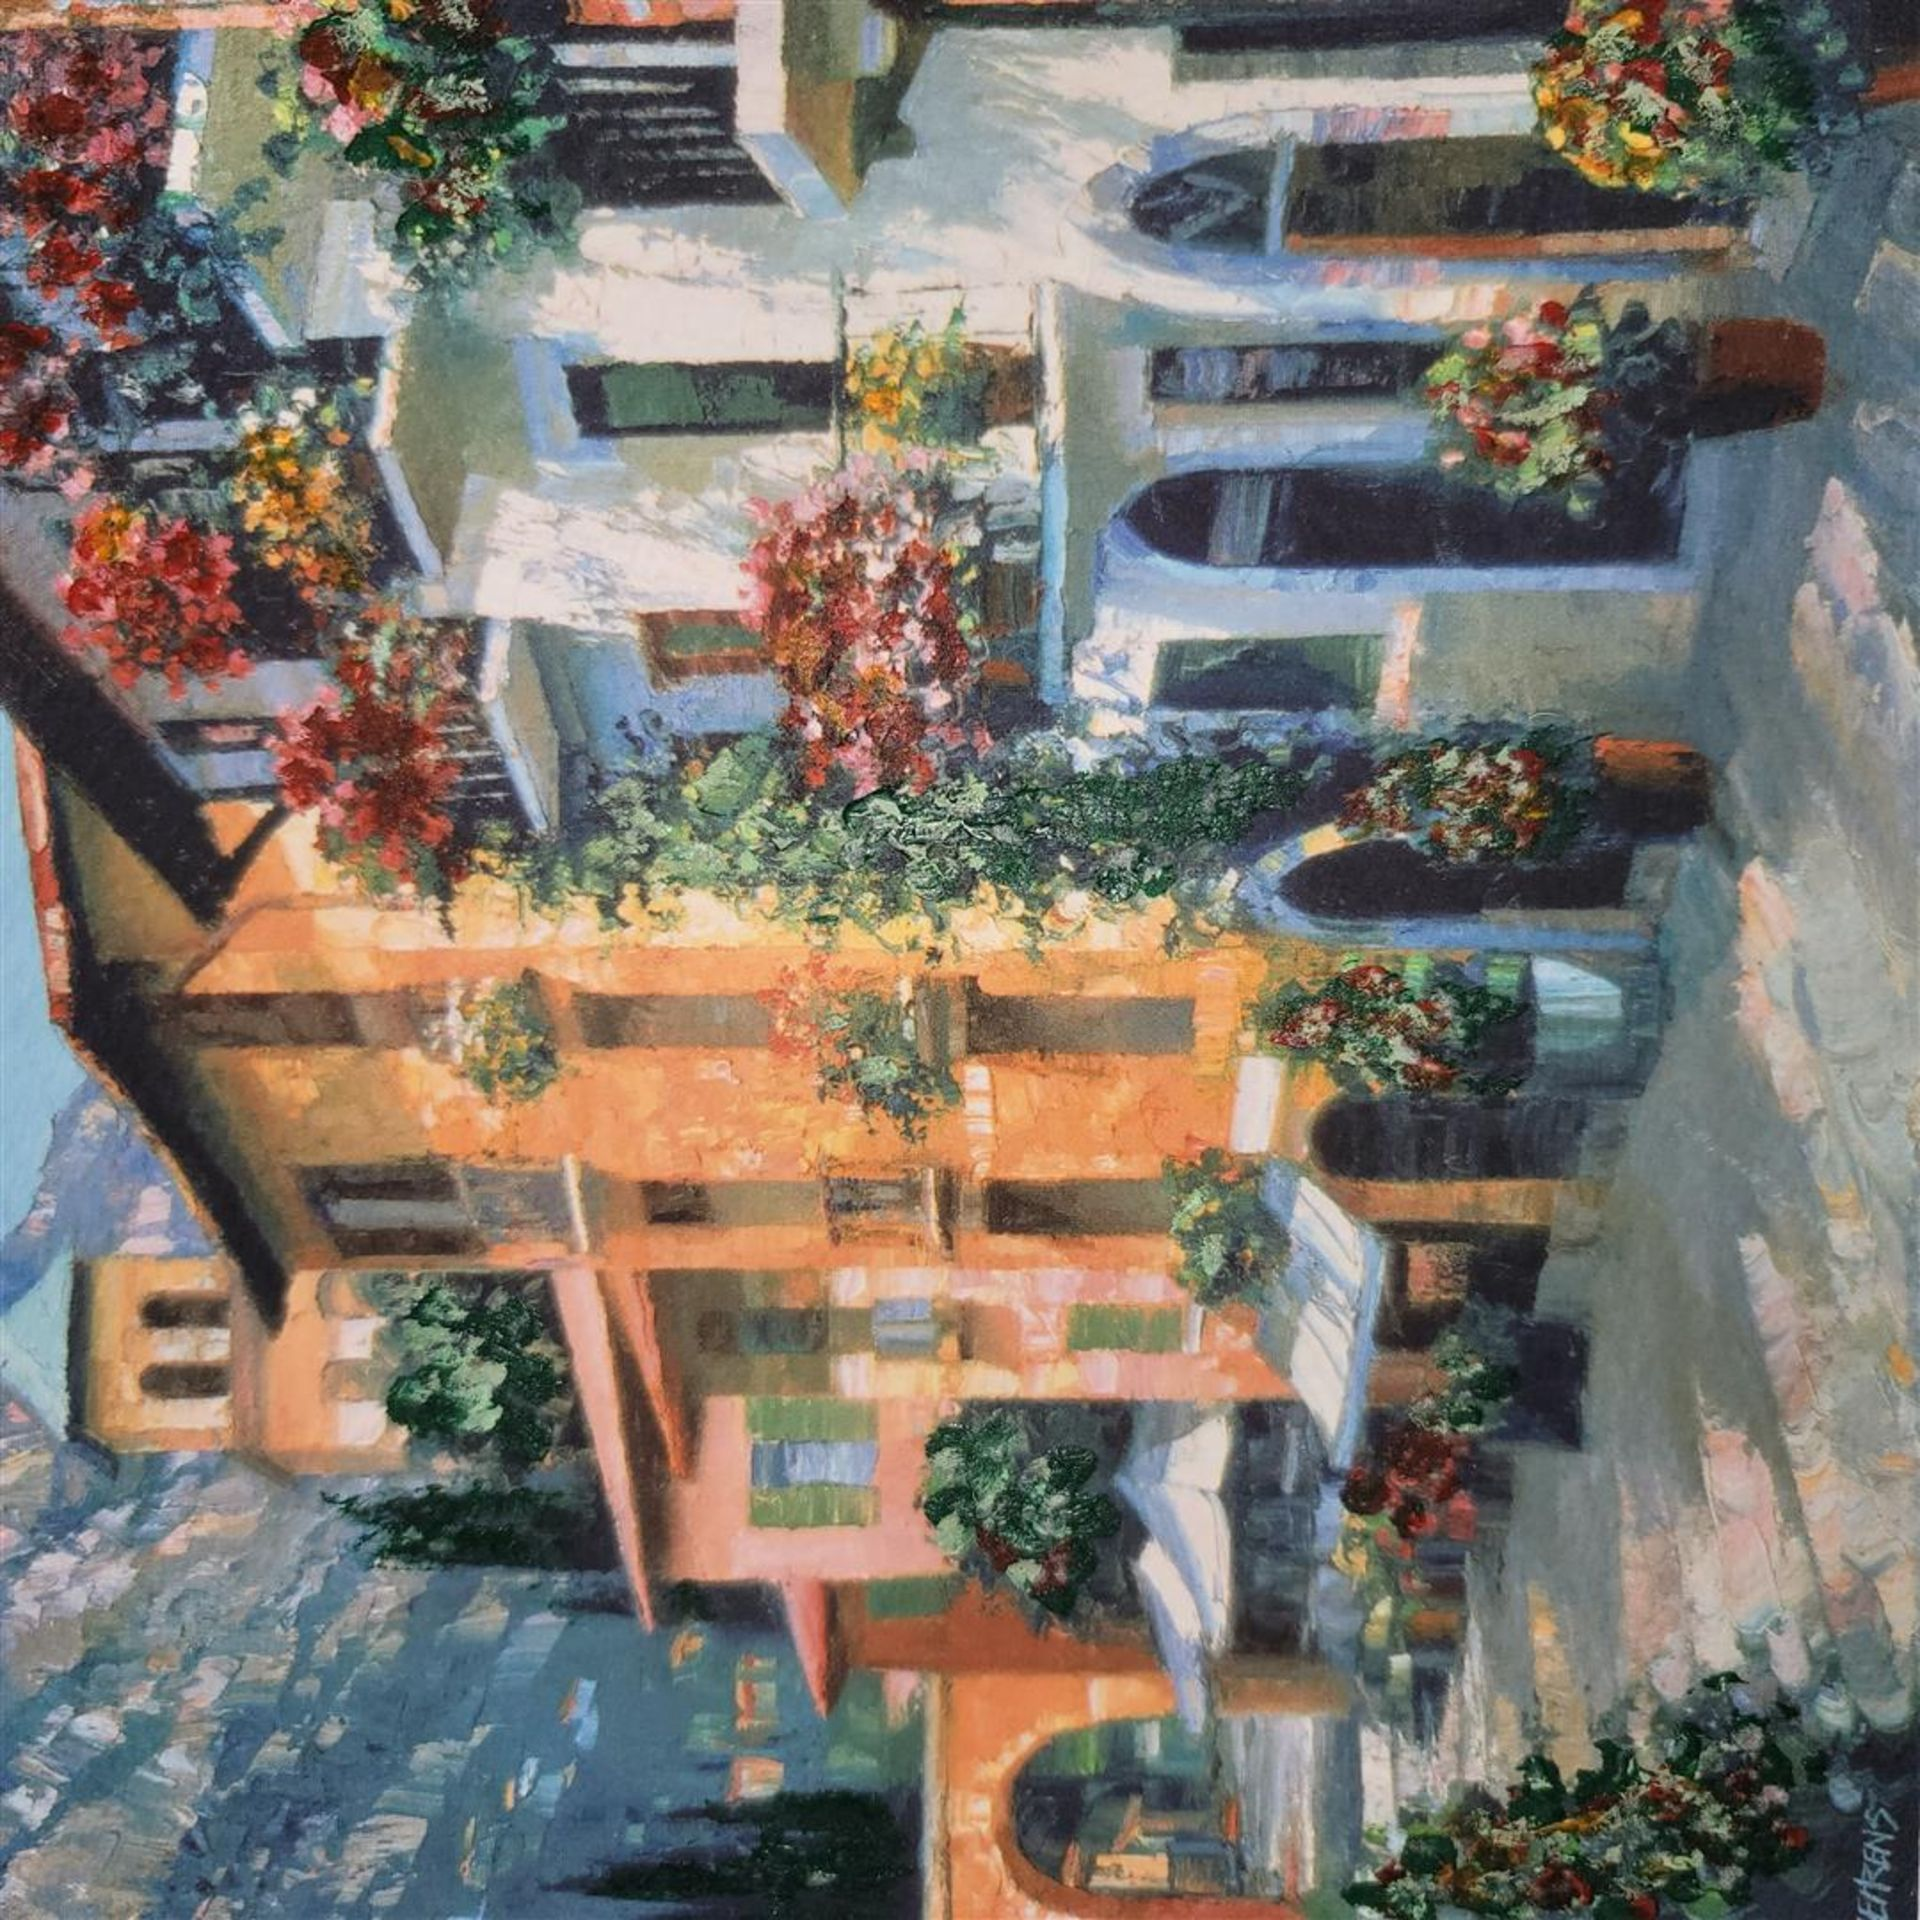 """Village Hideaway"" by Howard Behrens - Signed, Numbered, & Embellished - Image 4 of 4"